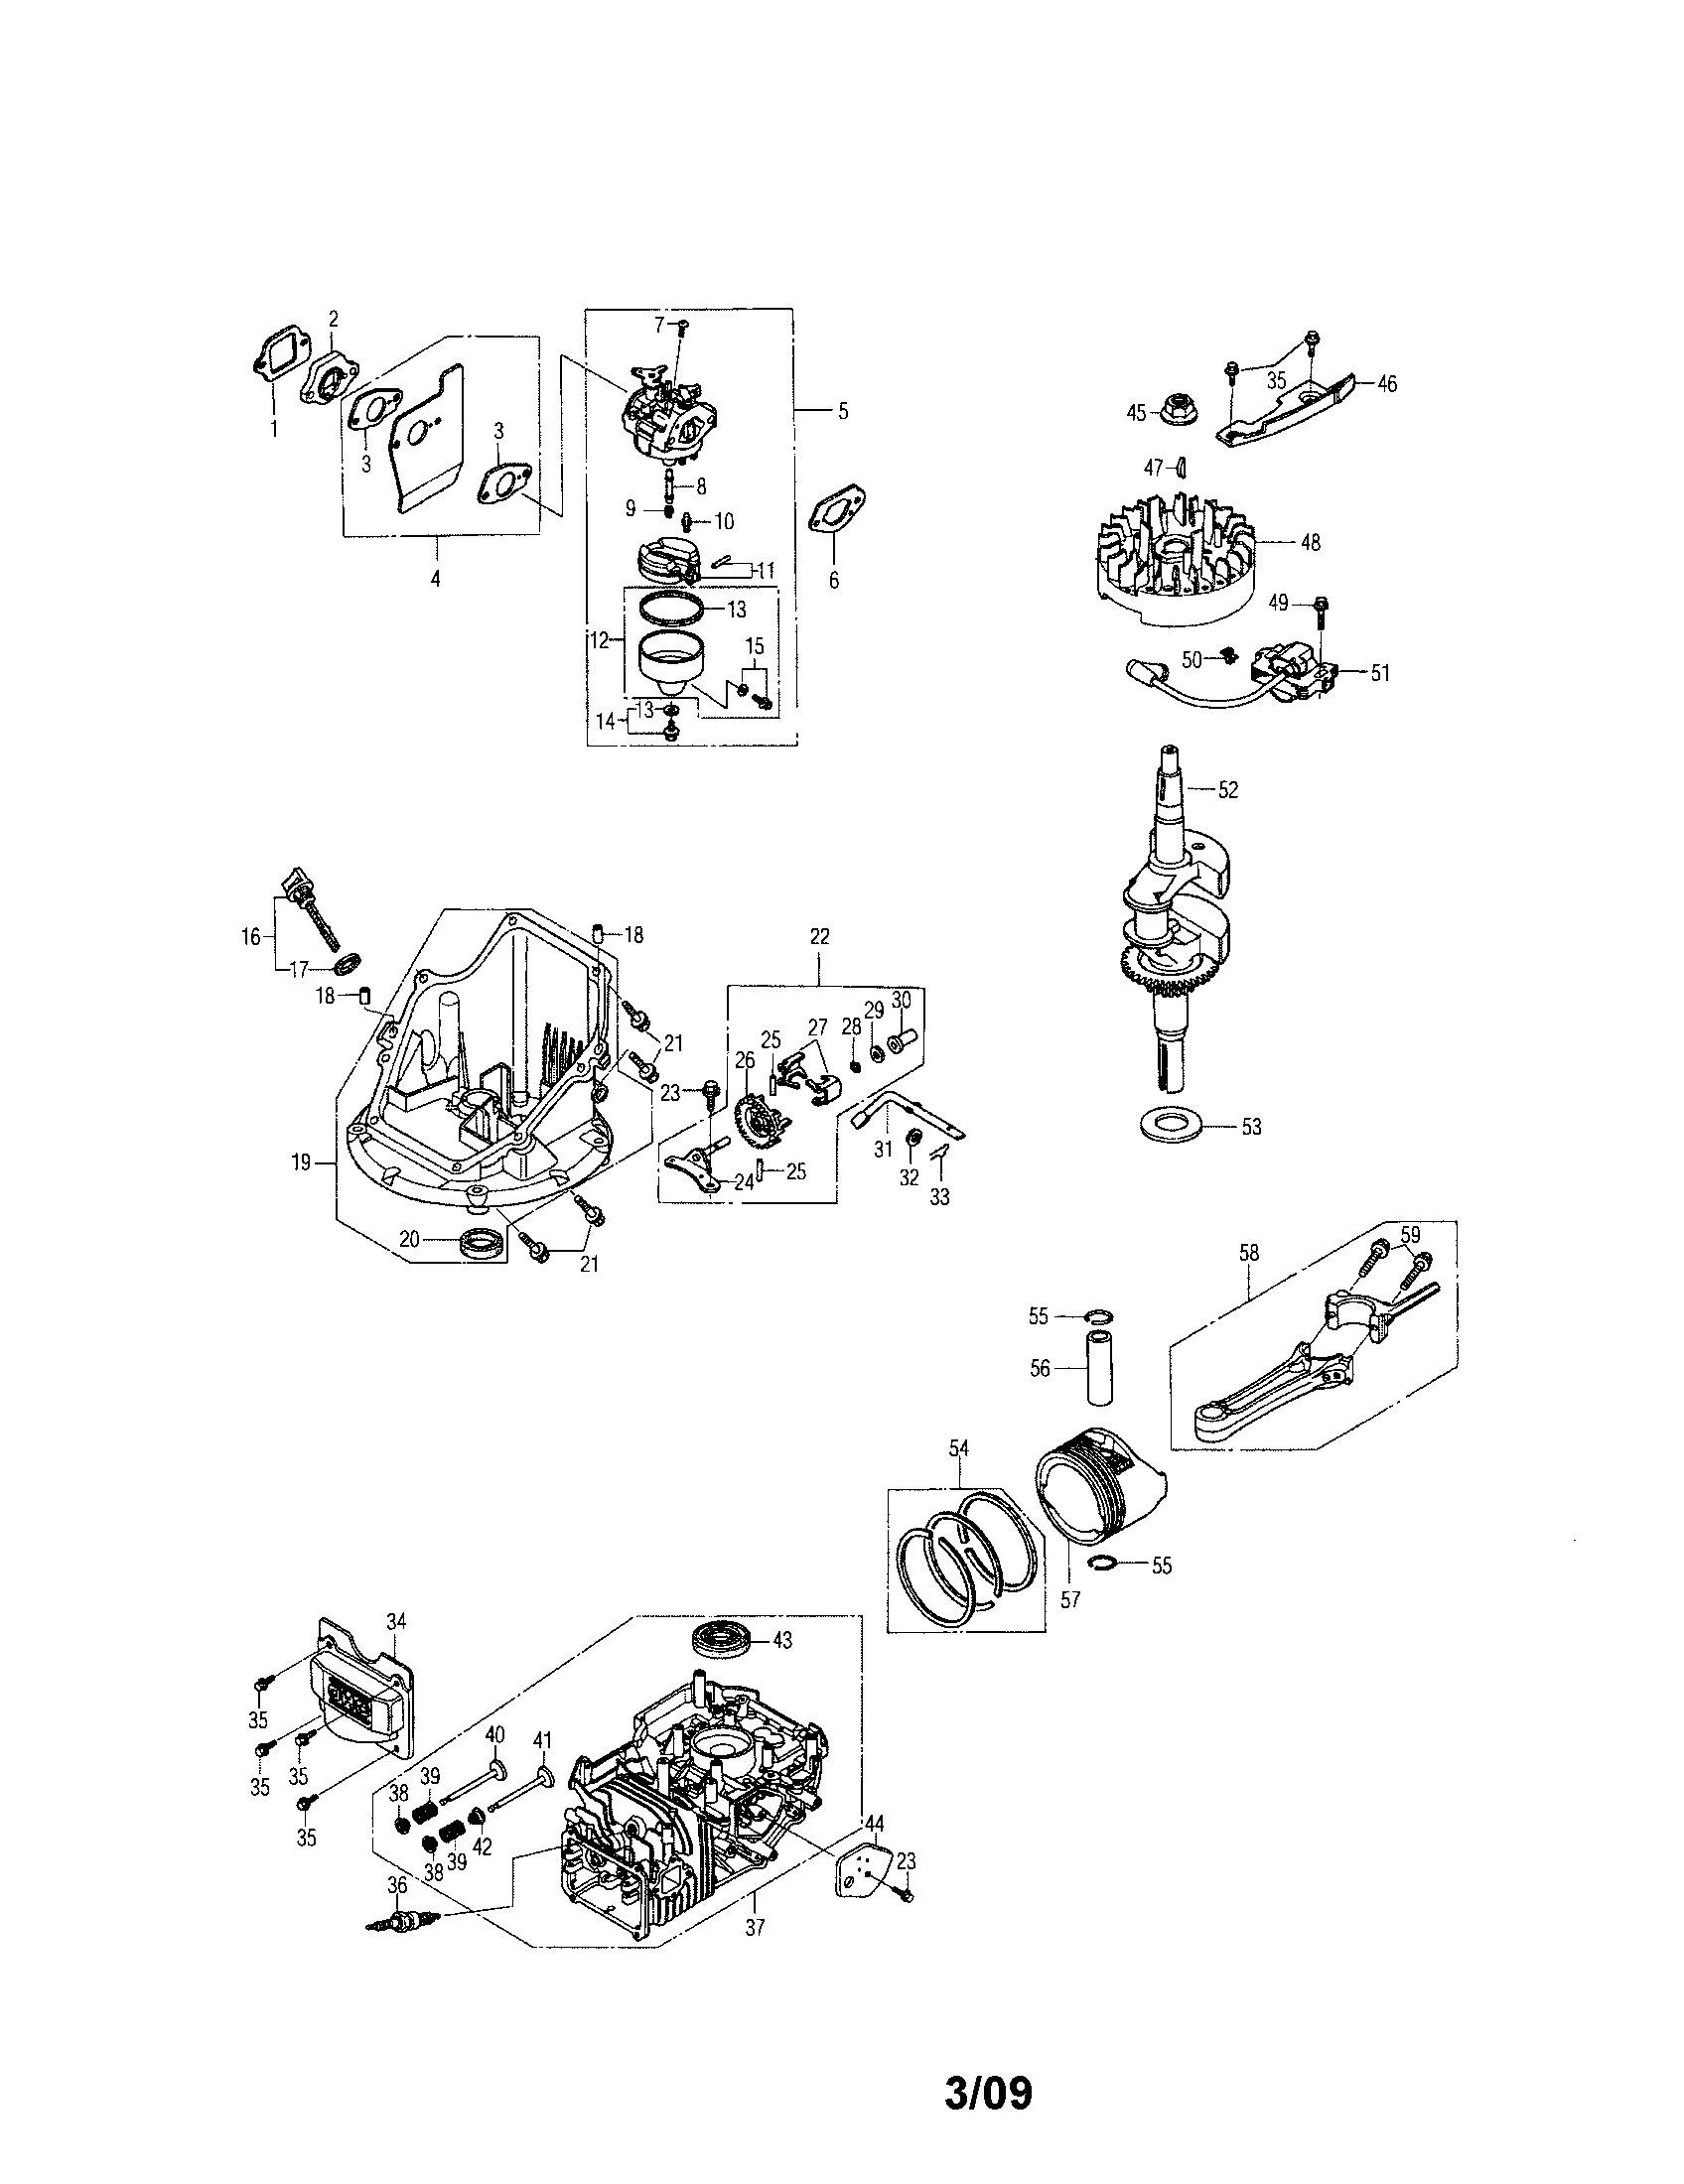 Honda Gcv160 Engine Parts Diagram Honda Gc160 Parts Diagram